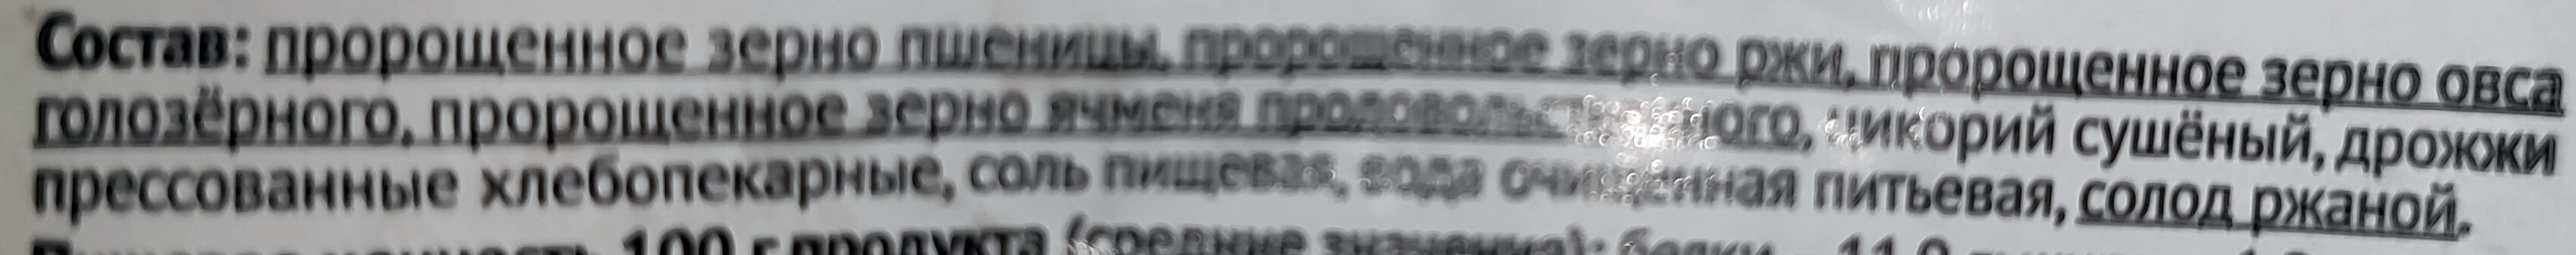 Целебный с цикорием - Ingredients - ru